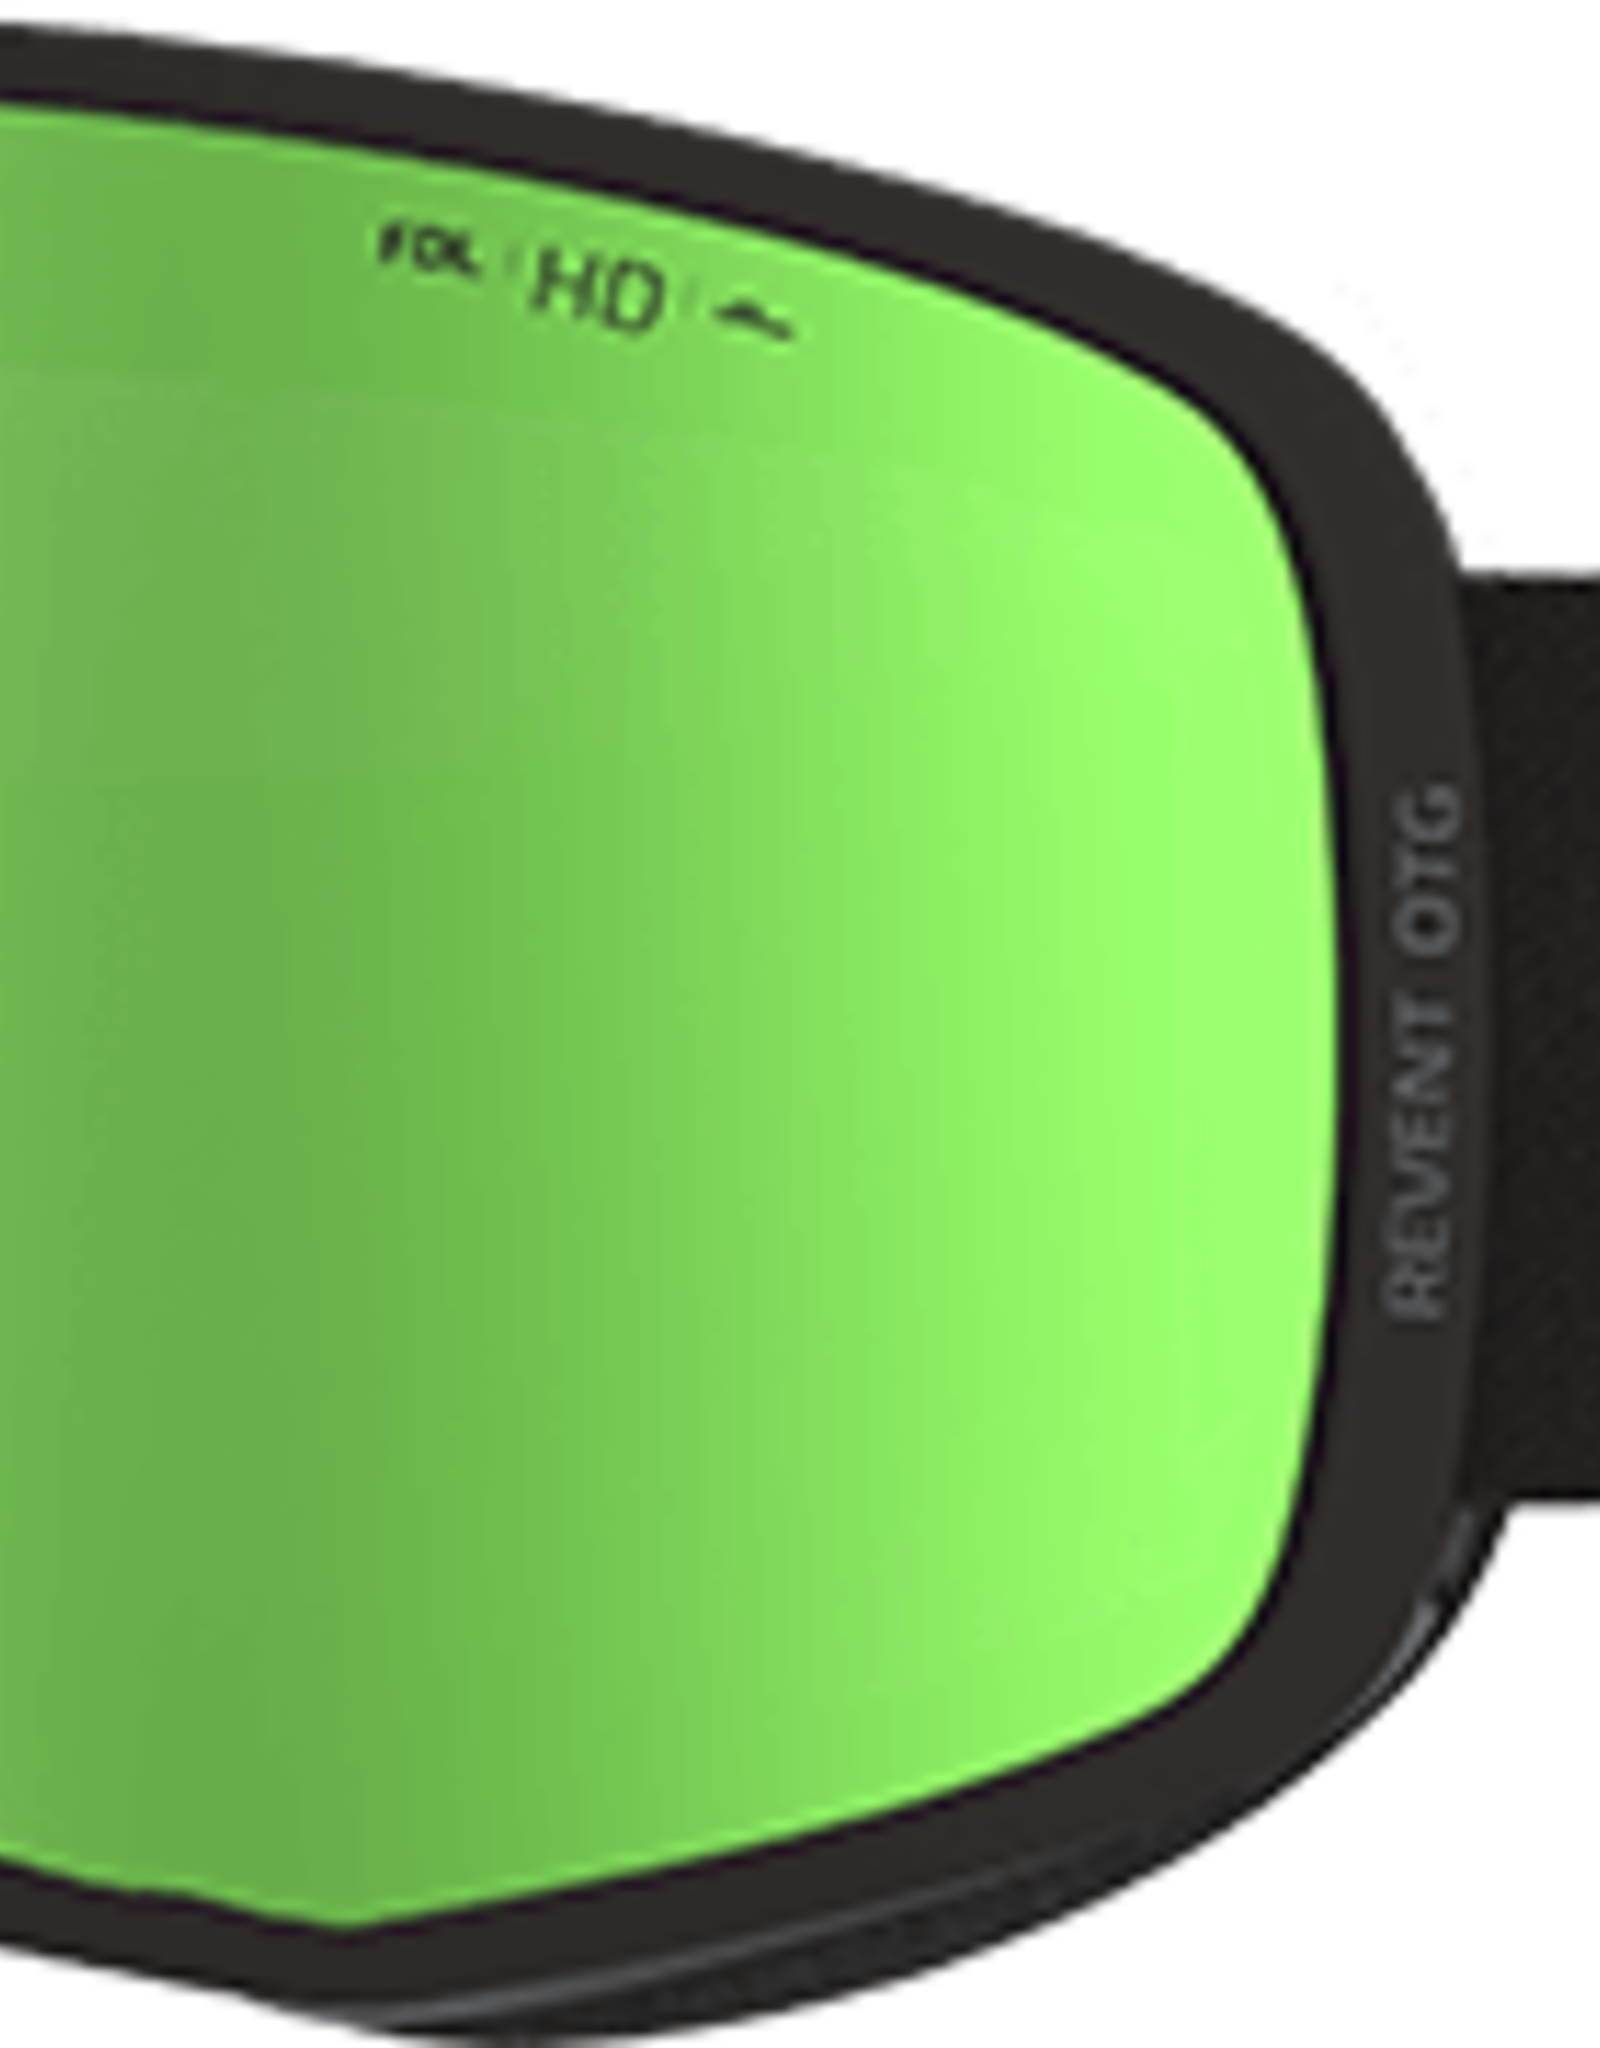 Atomic Revent Otg Hd  -W2020